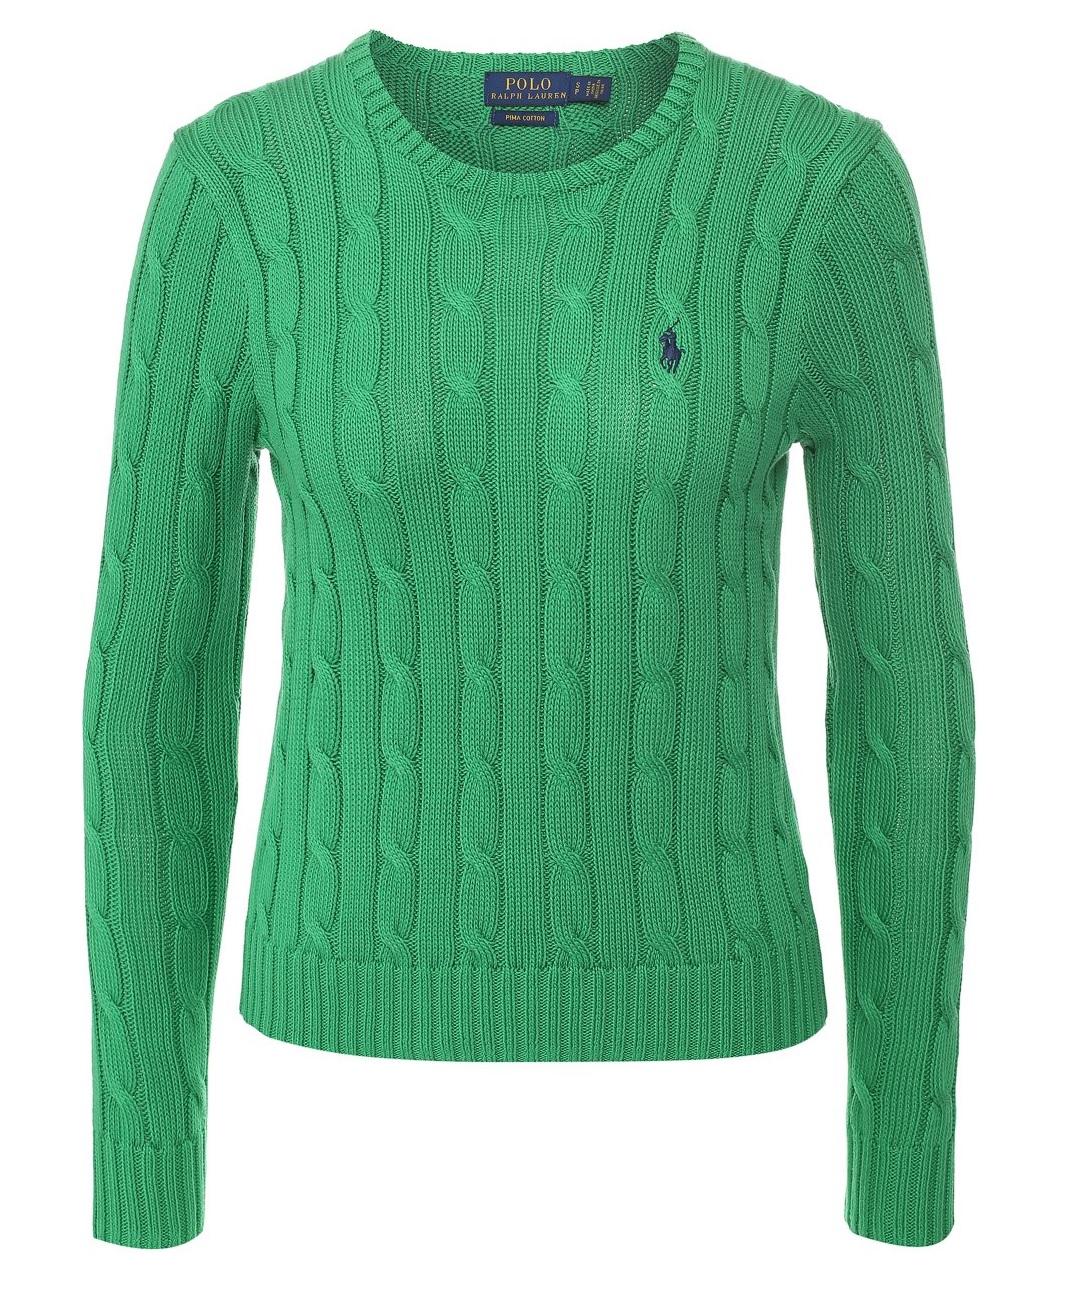 Ralph Laureen Cable Knit Full Sleeve  BrandNew Jumper,Tops,Tshirt,SweatShirt